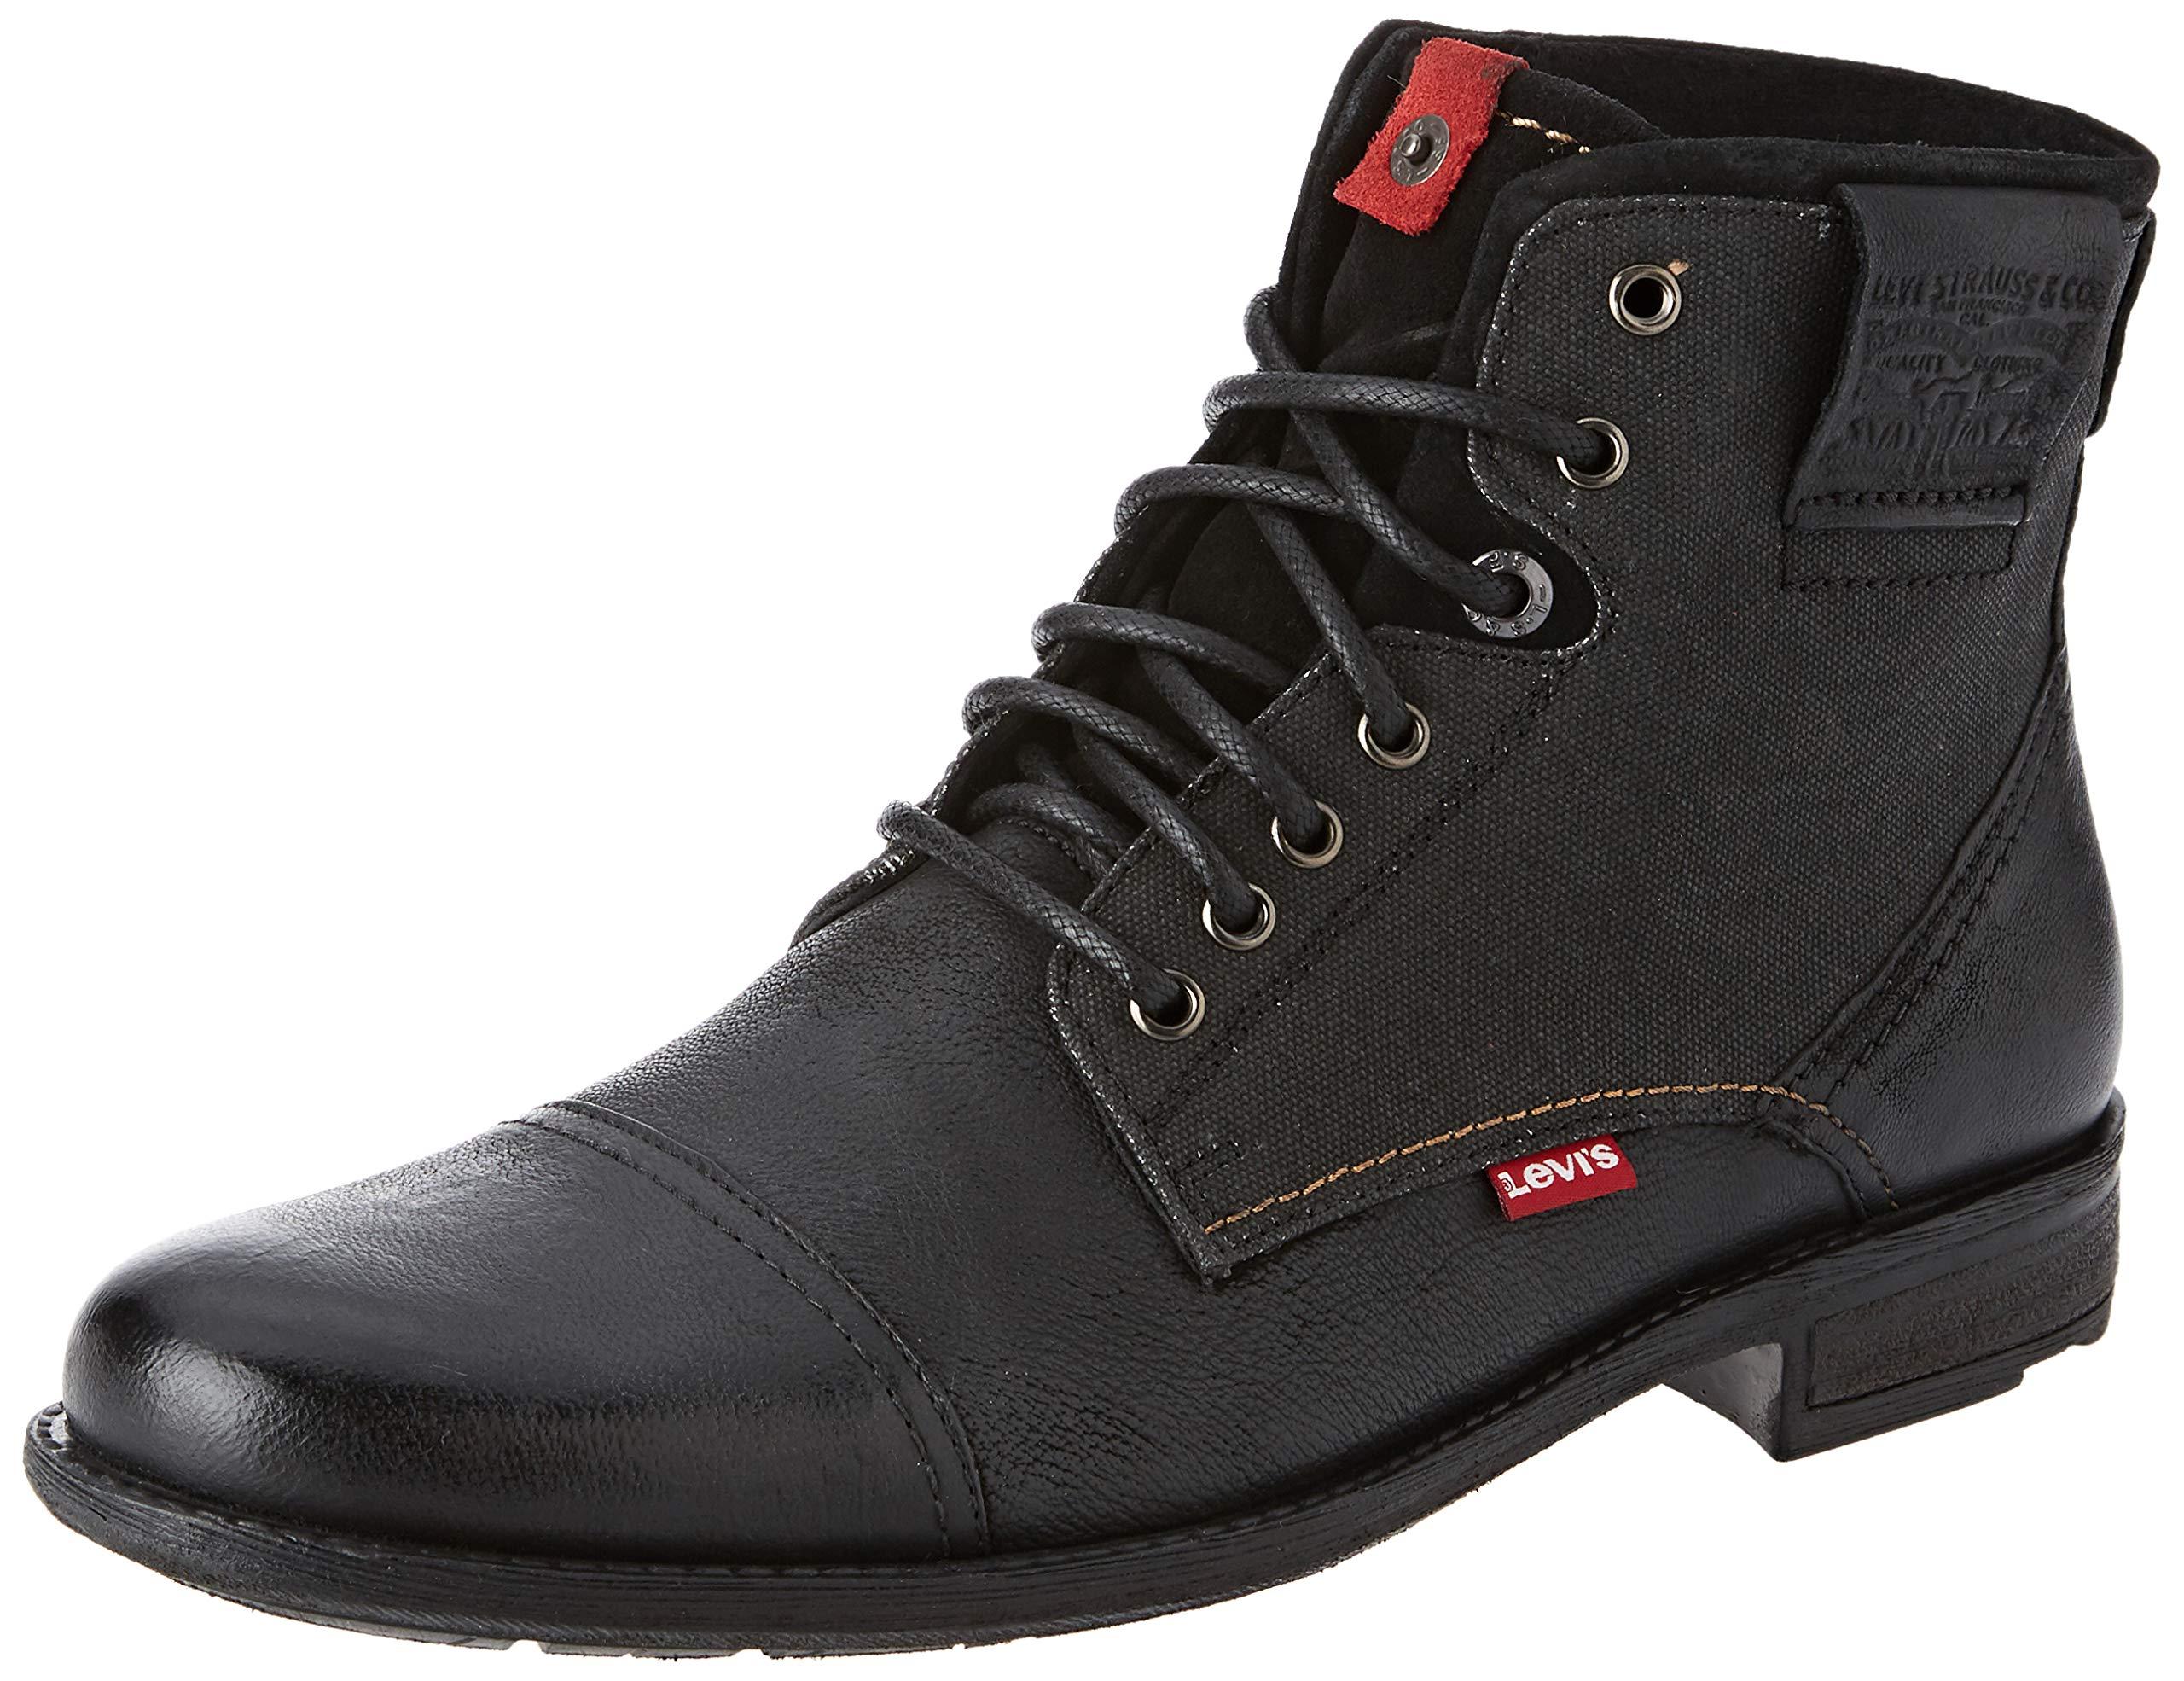 Levi's Men's Fowler Biker Boots 1